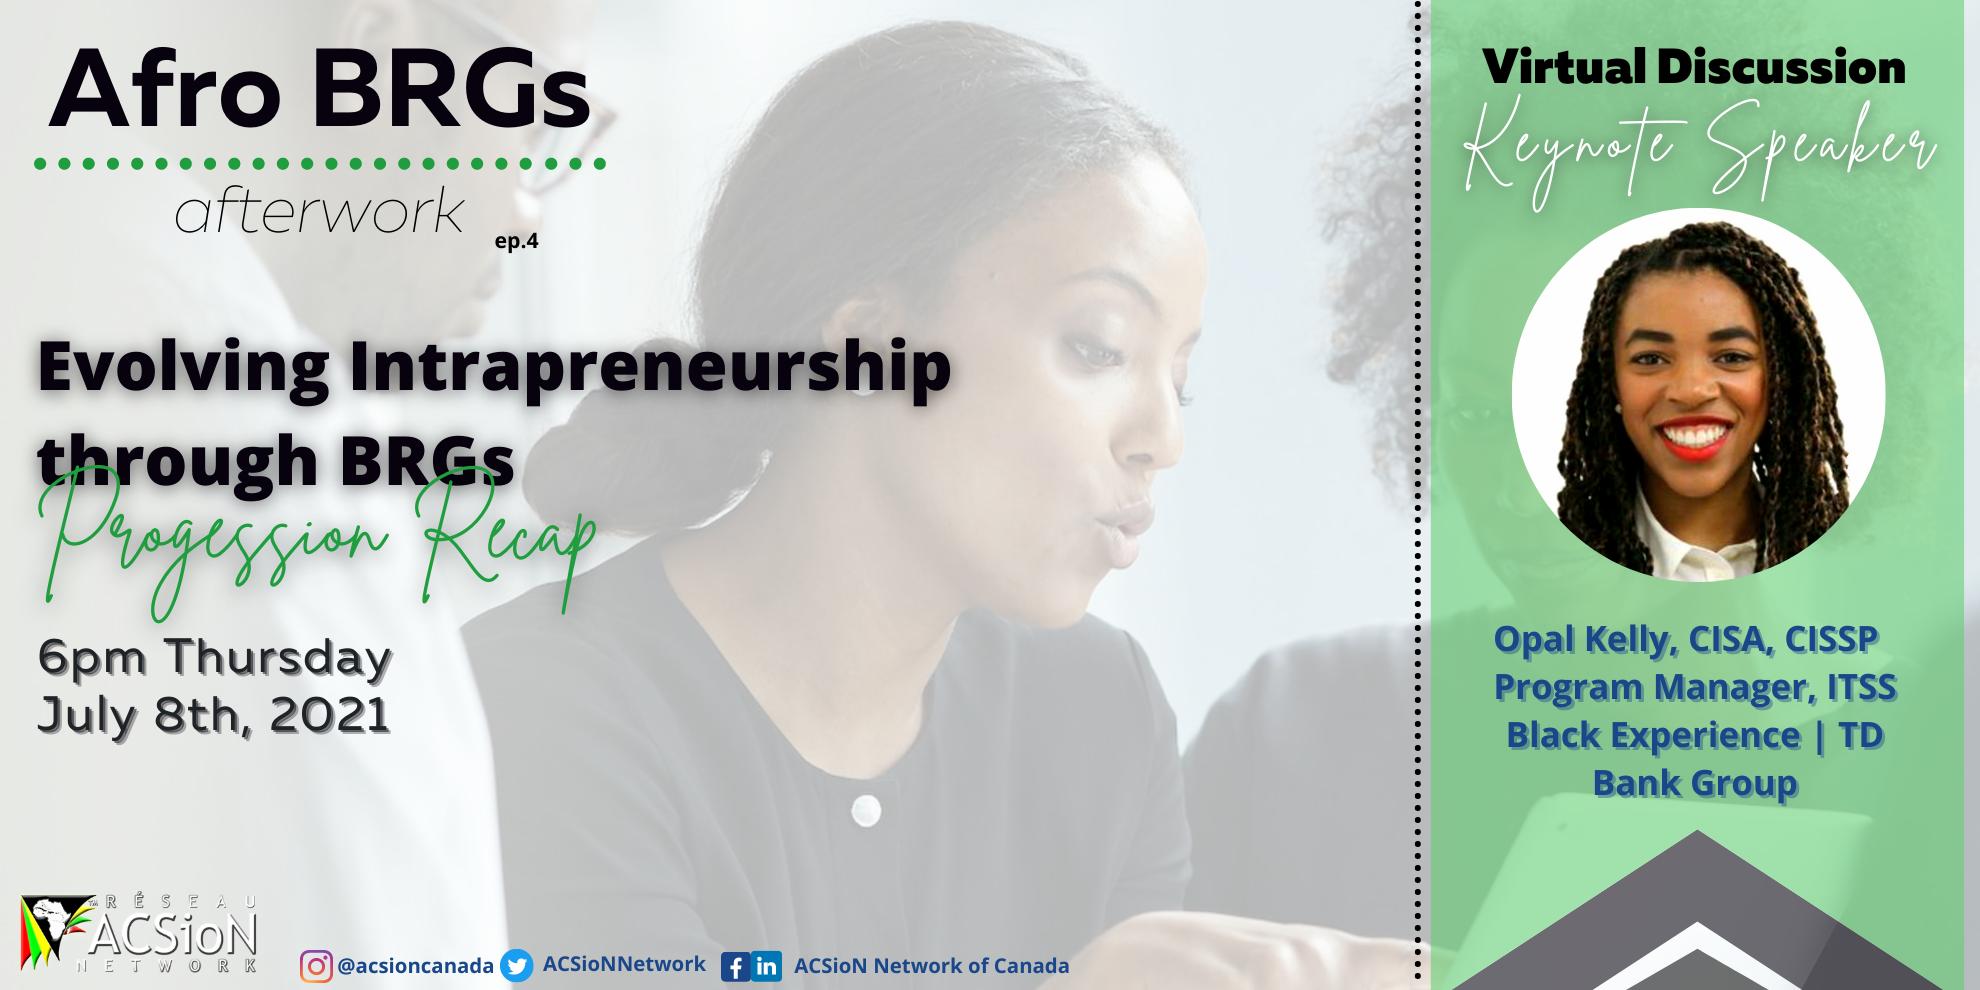 2021-07-08 - Evolving Intrapreneurship through BRGs - Afro BRGs Afterwork(2to1)